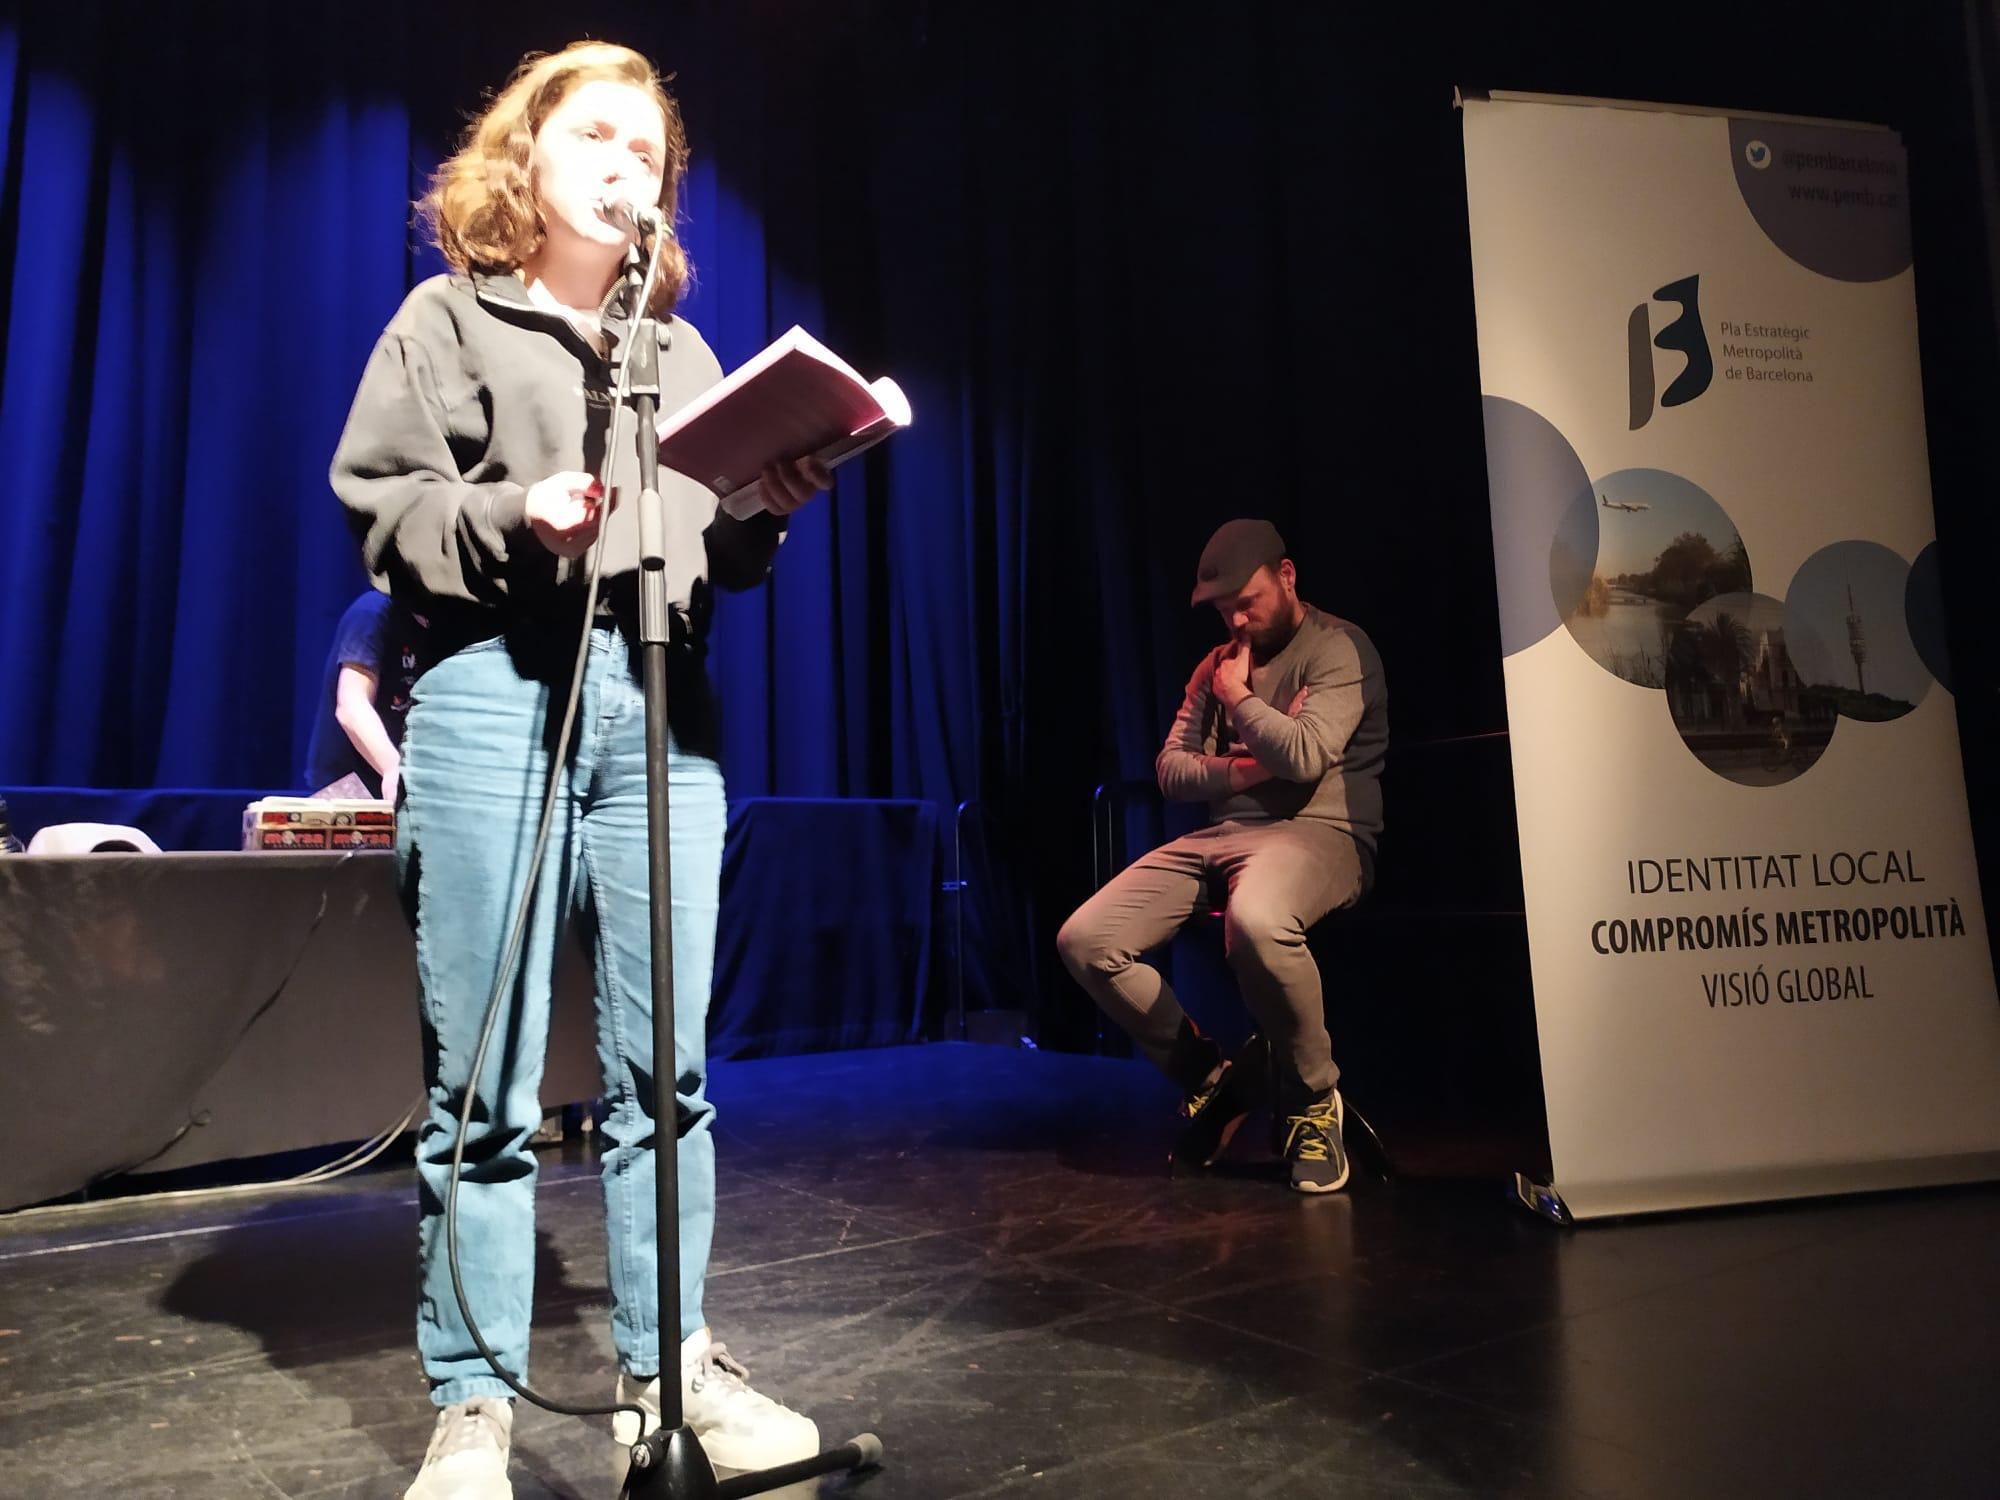 La finalista Ainara García, de Saragossa, al teatre Cal Ninyo